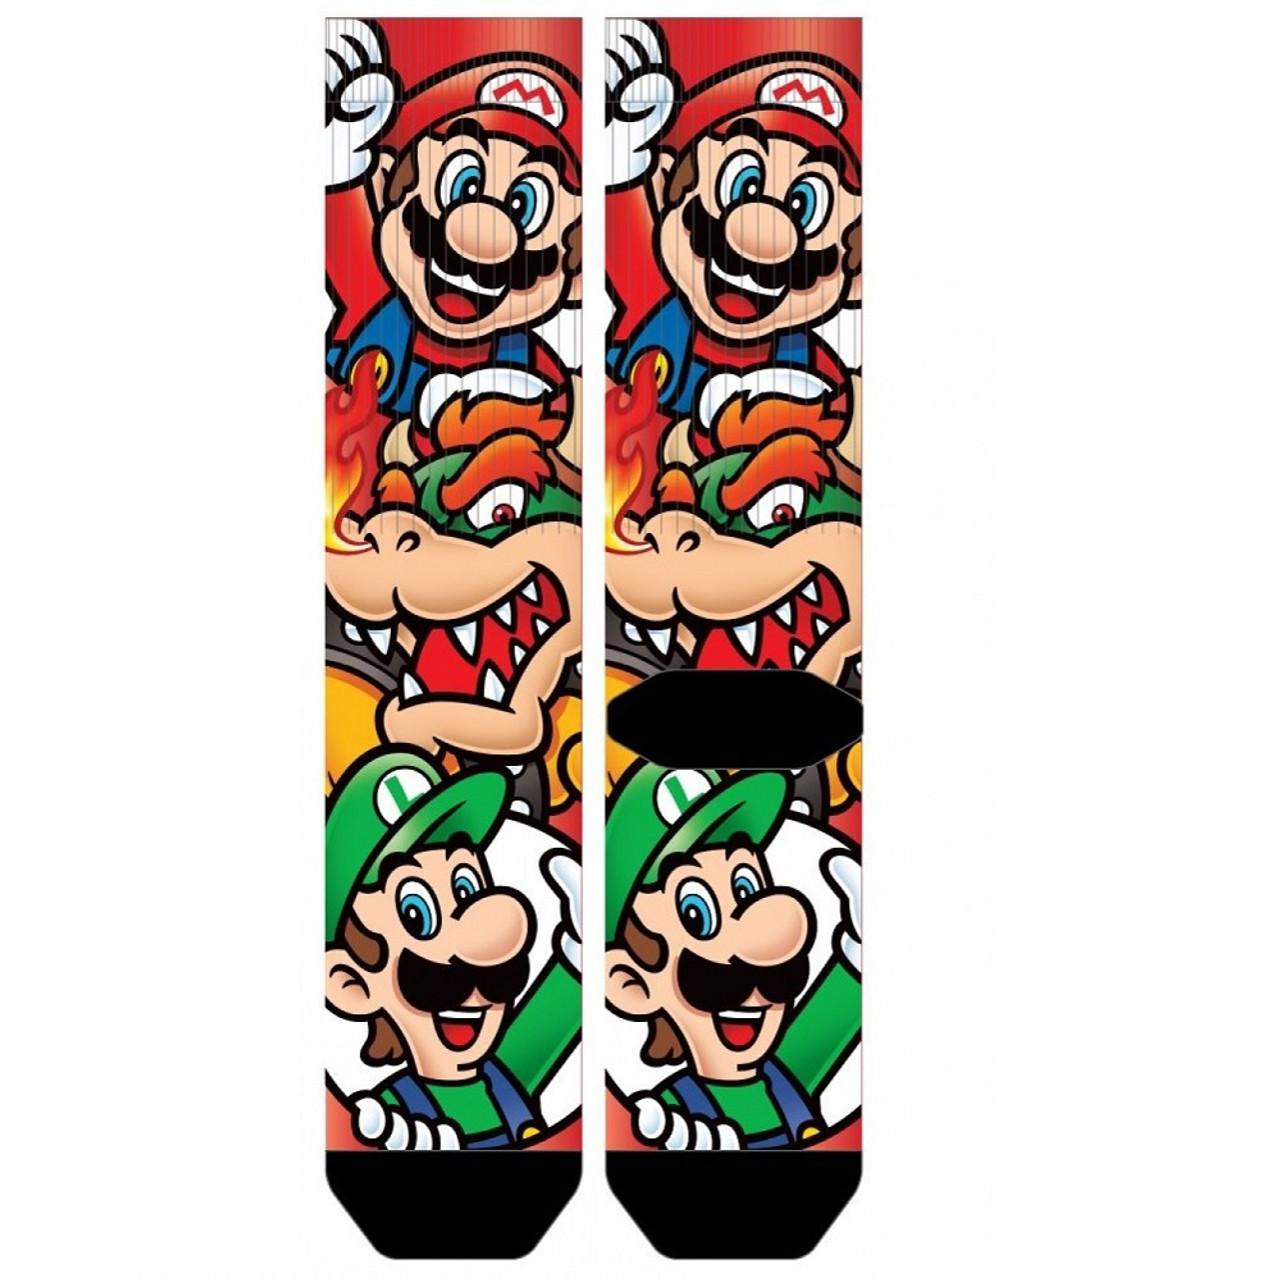 Nintendo Super Mario, Luigi & Bowser Sublimated Socks By Bioworld